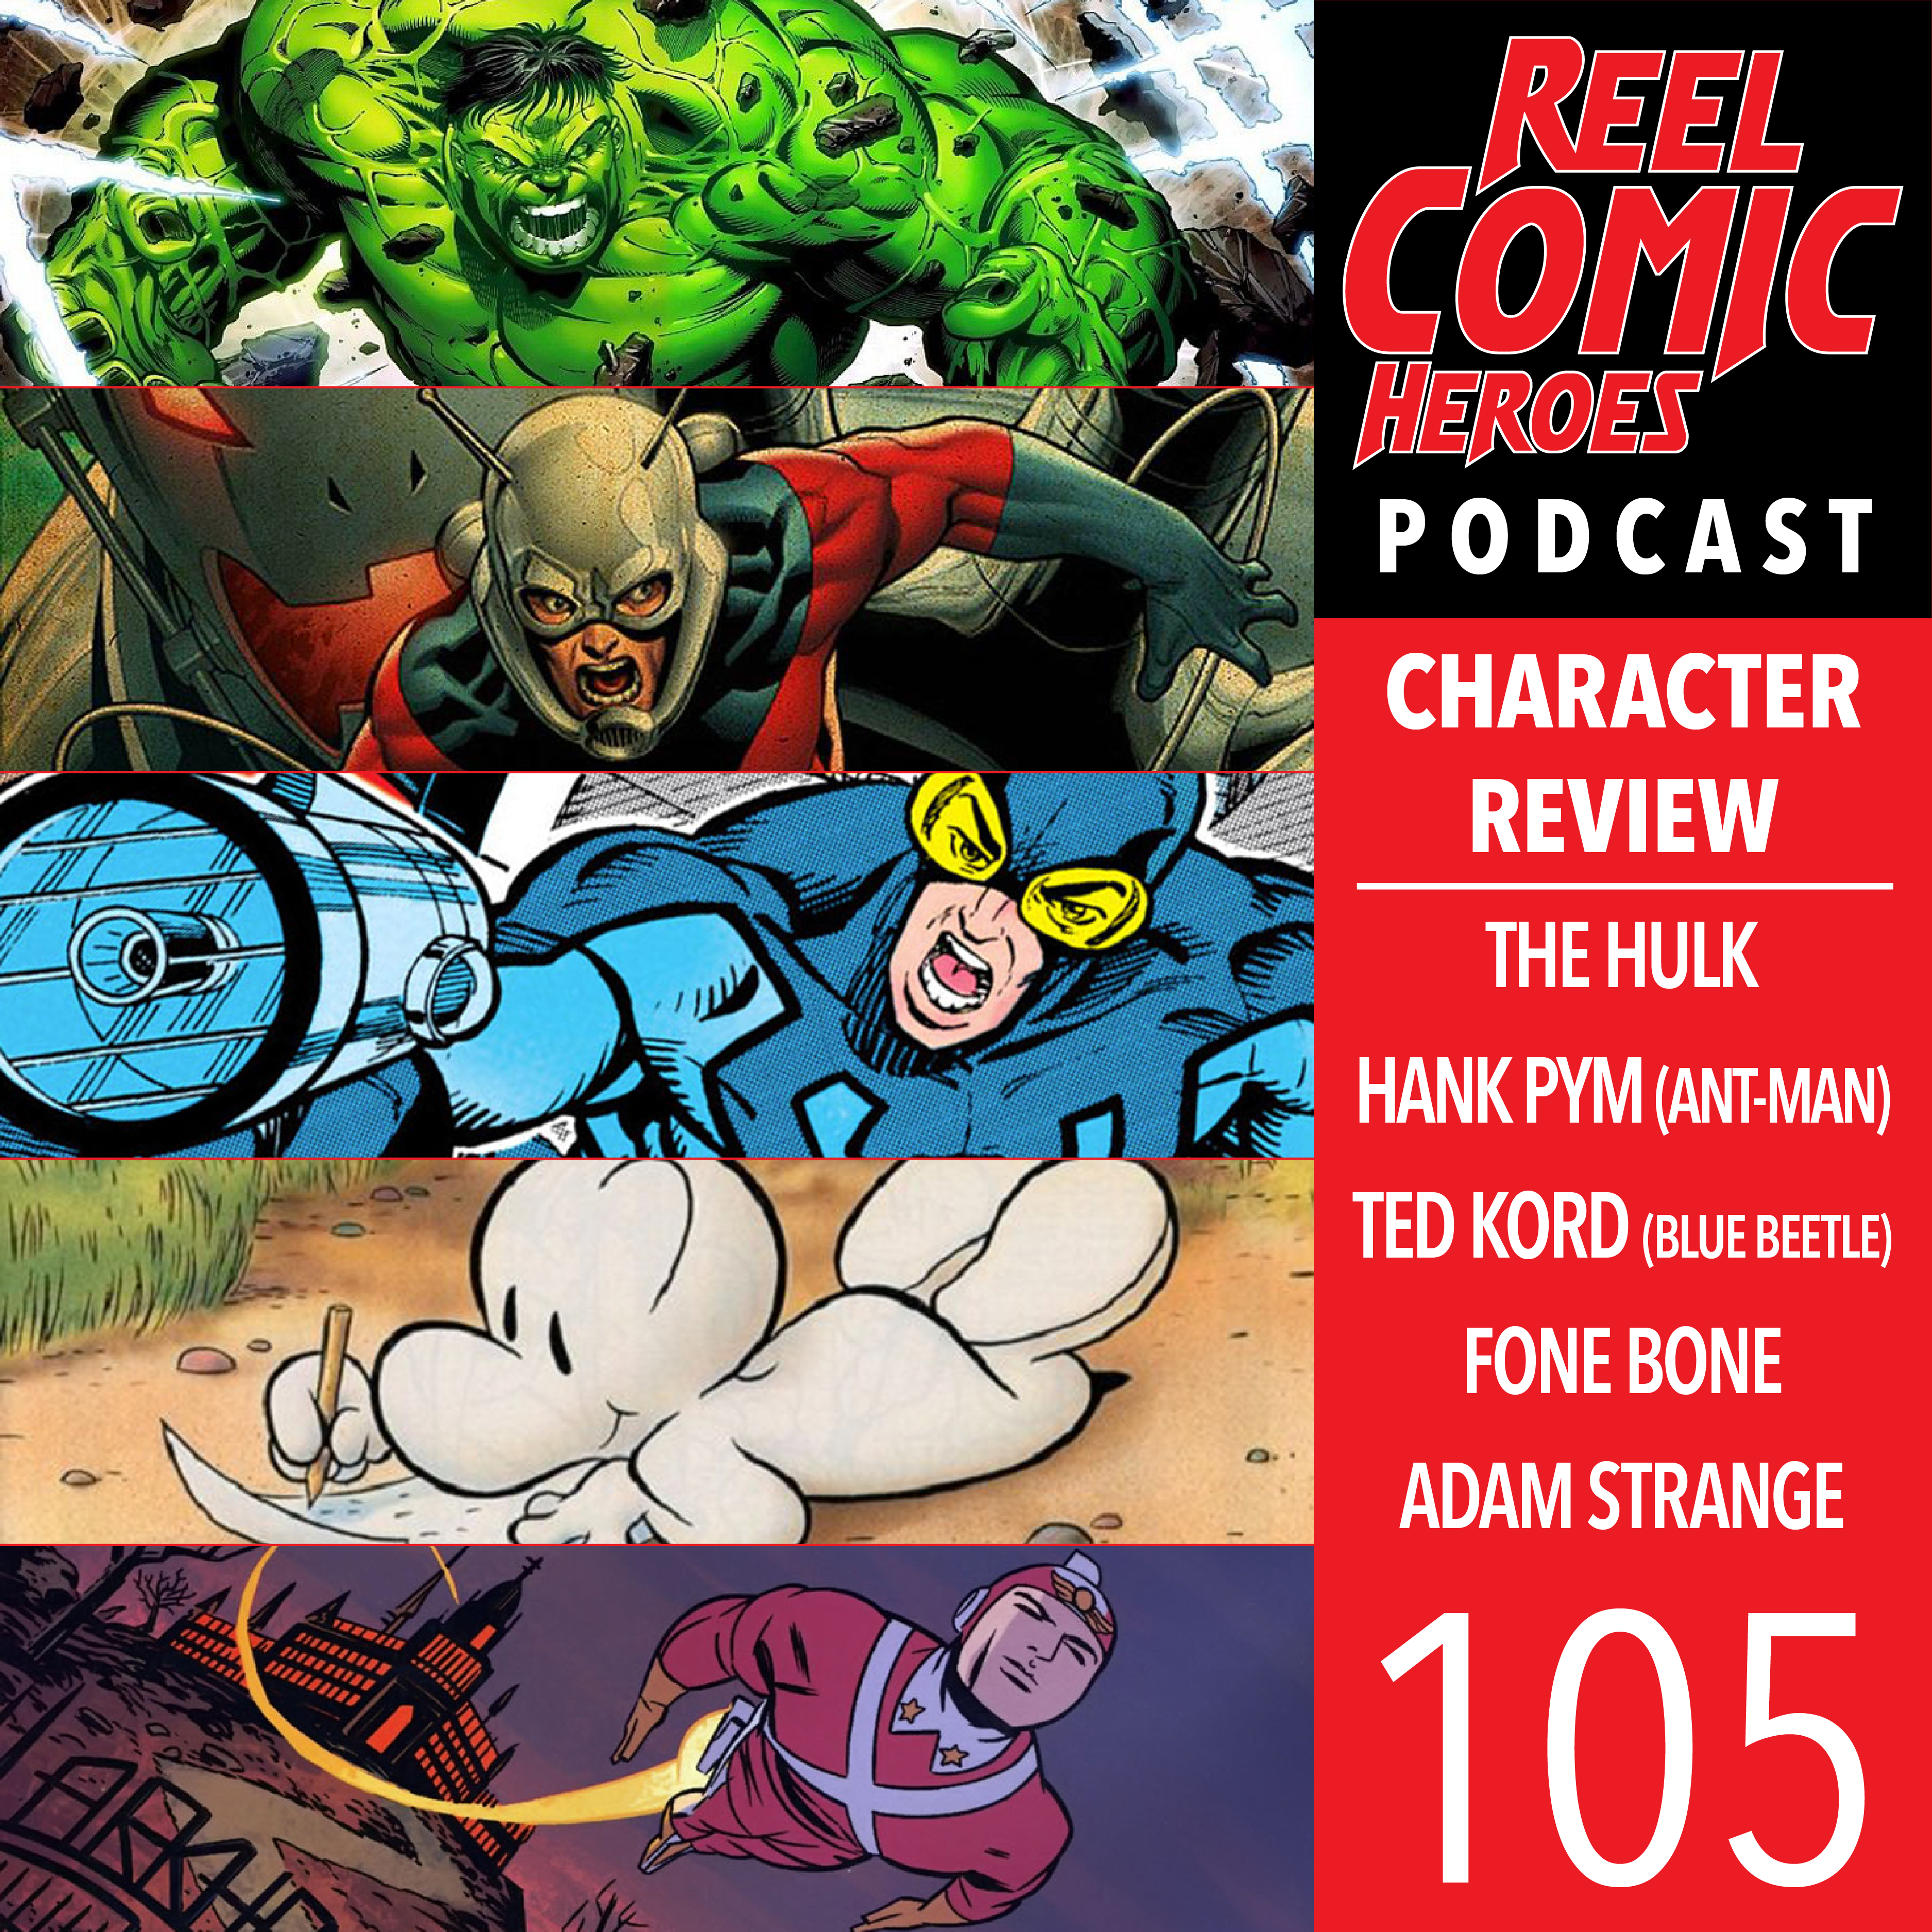 Artwork for 105 - Character Review - The Hulk, Hank Pym (Ant-Man), Ted Kord (Blue Beetle), Fone Bone, & Adam Strange